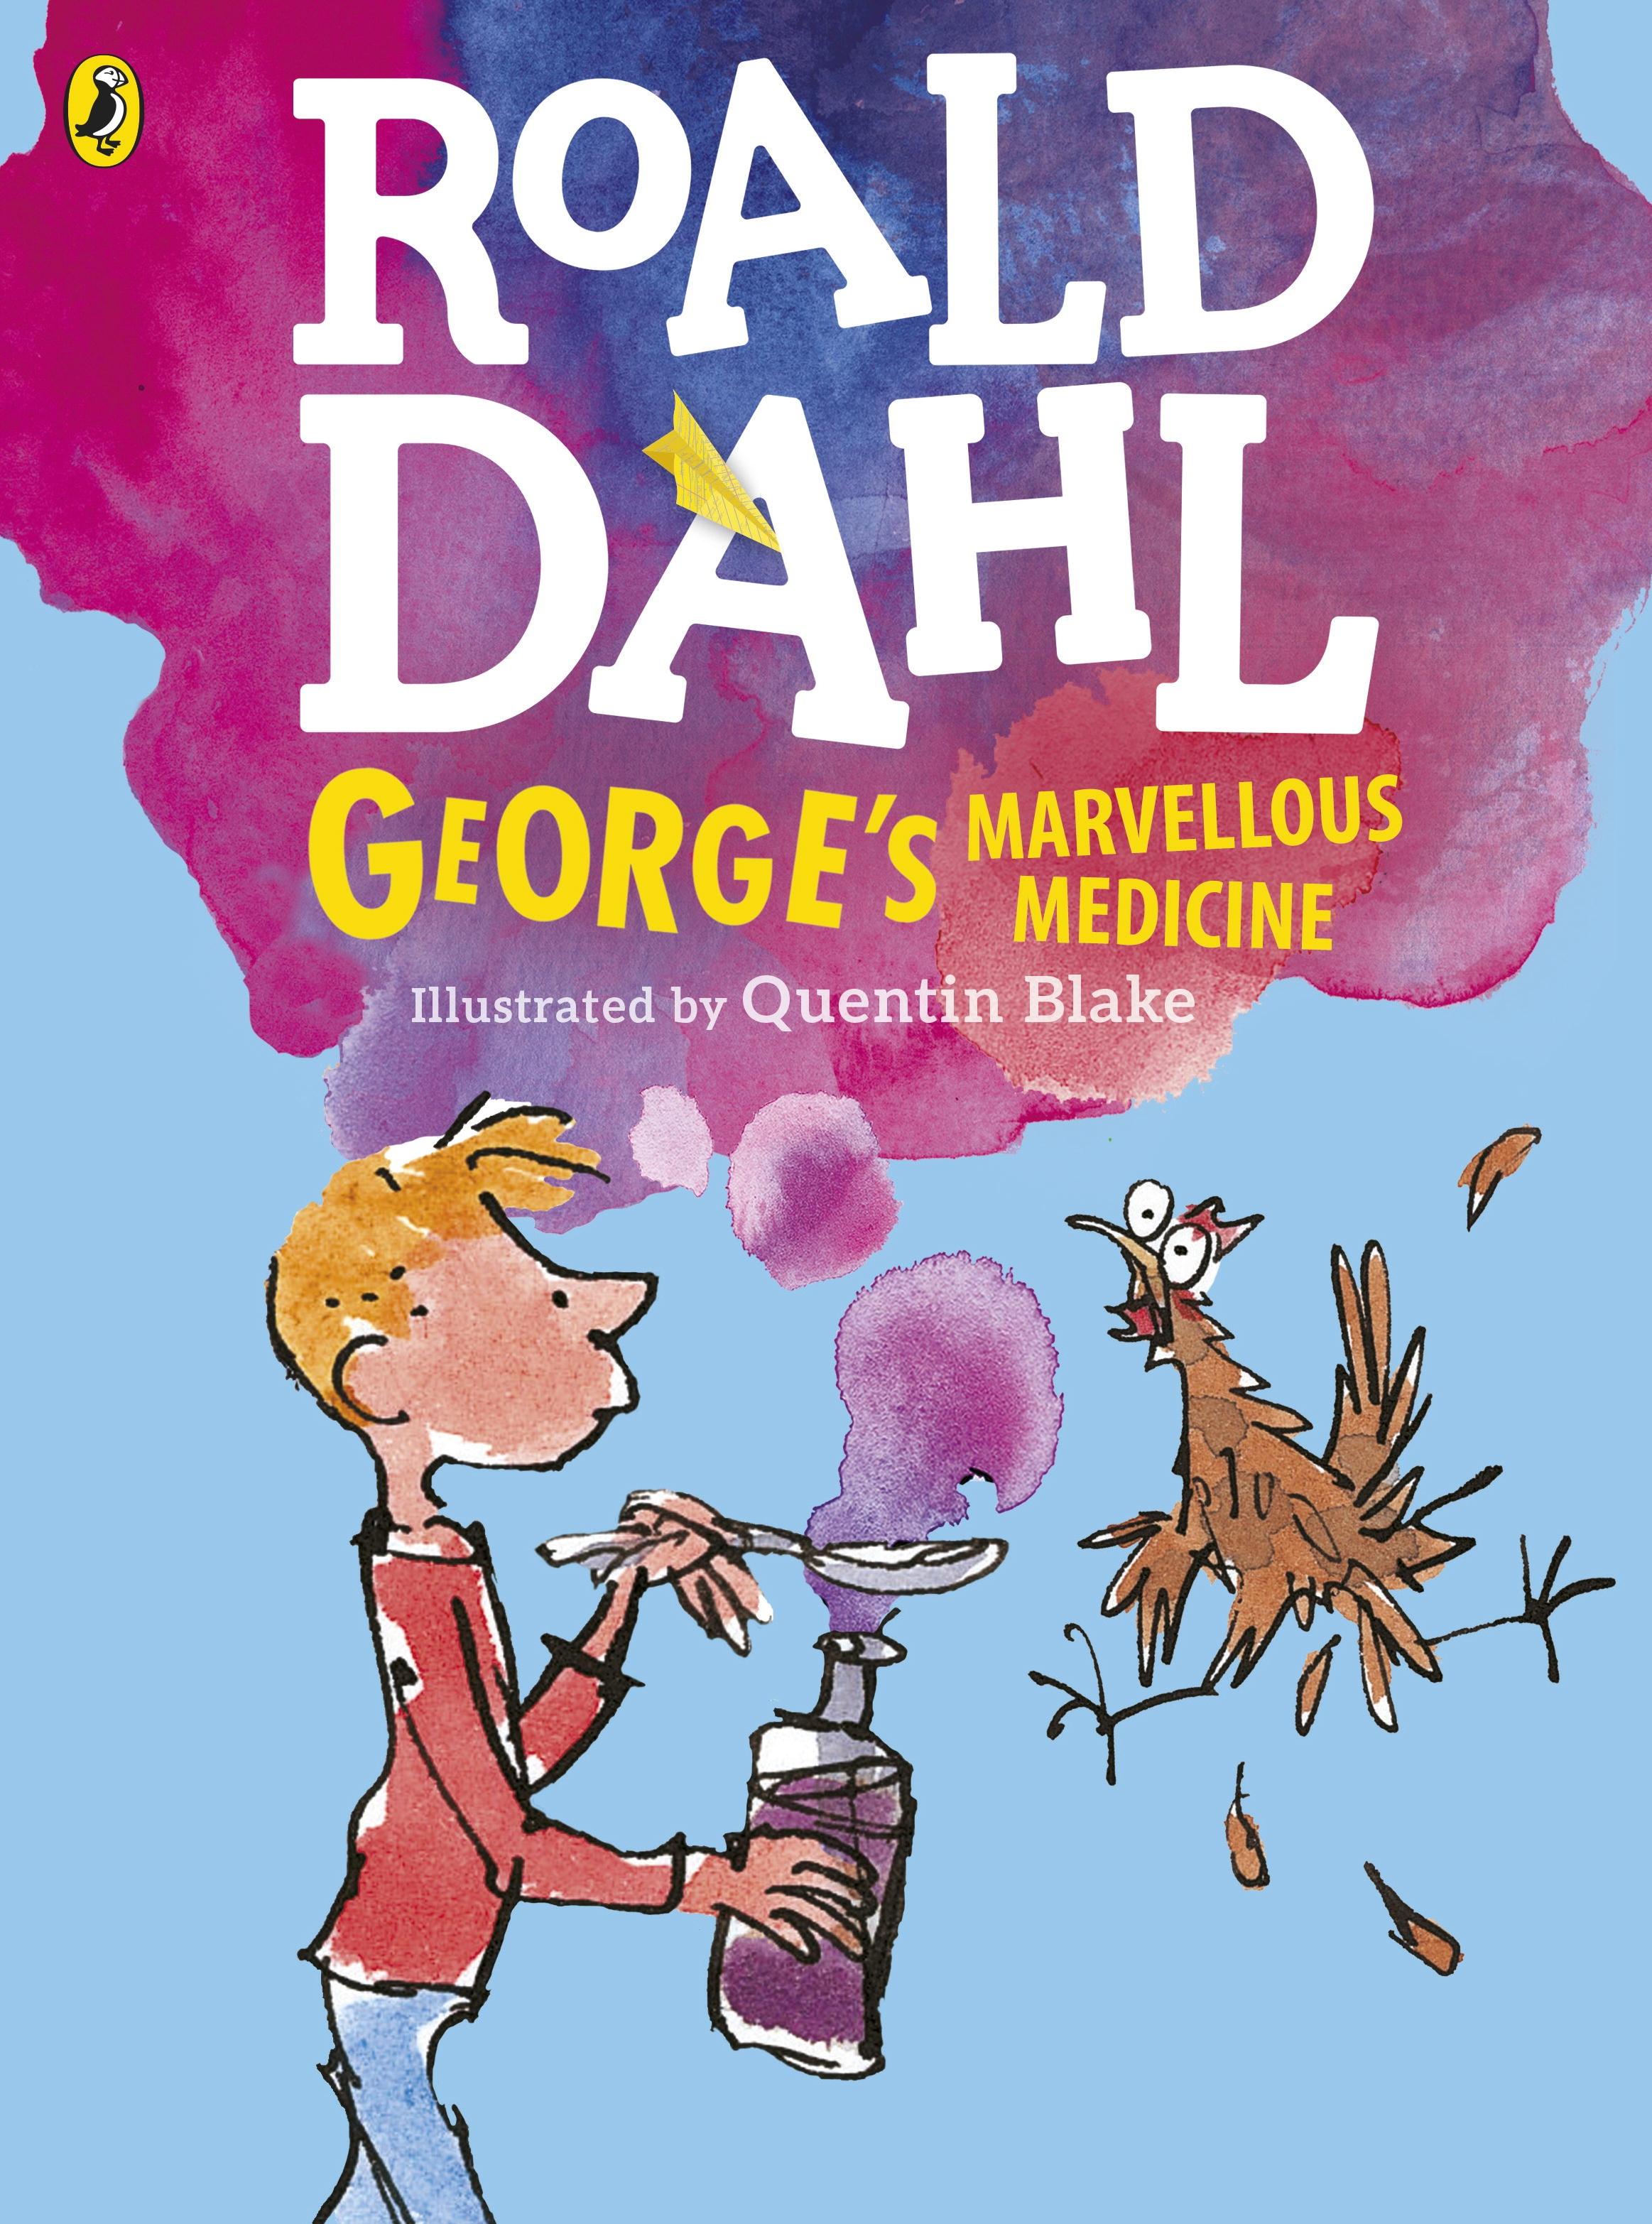 Roald Dahl Book Cover Pictures : George s marvellous medicine by roald dahl penguin books